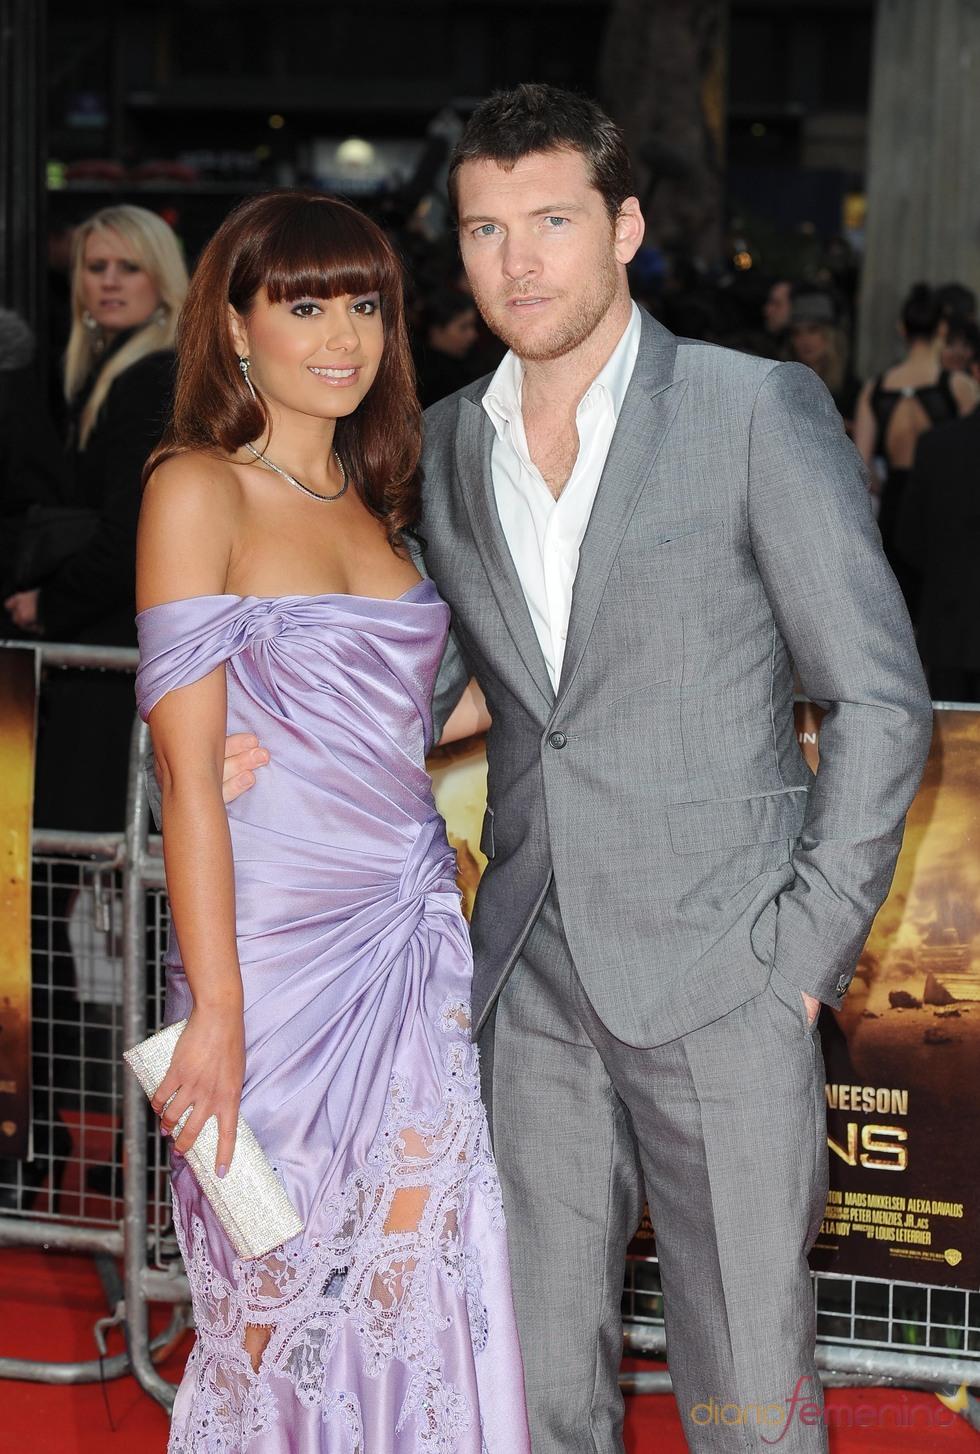 Sam Worthington con su novia, Natalie Mark